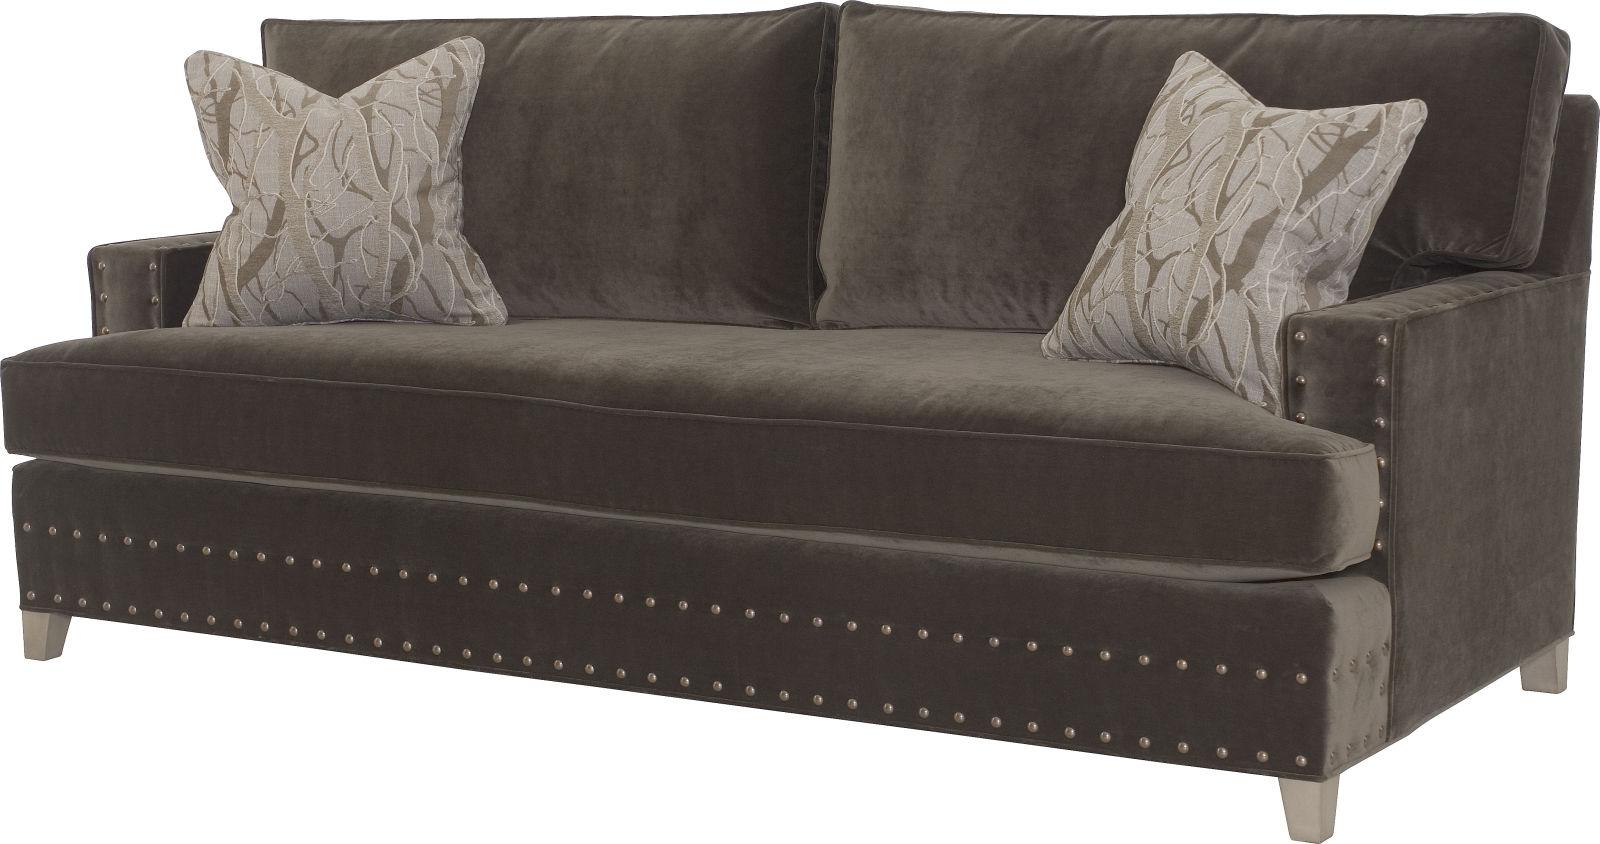 wesley hall sofas sofa sfc furniture hickory nc product page 1966